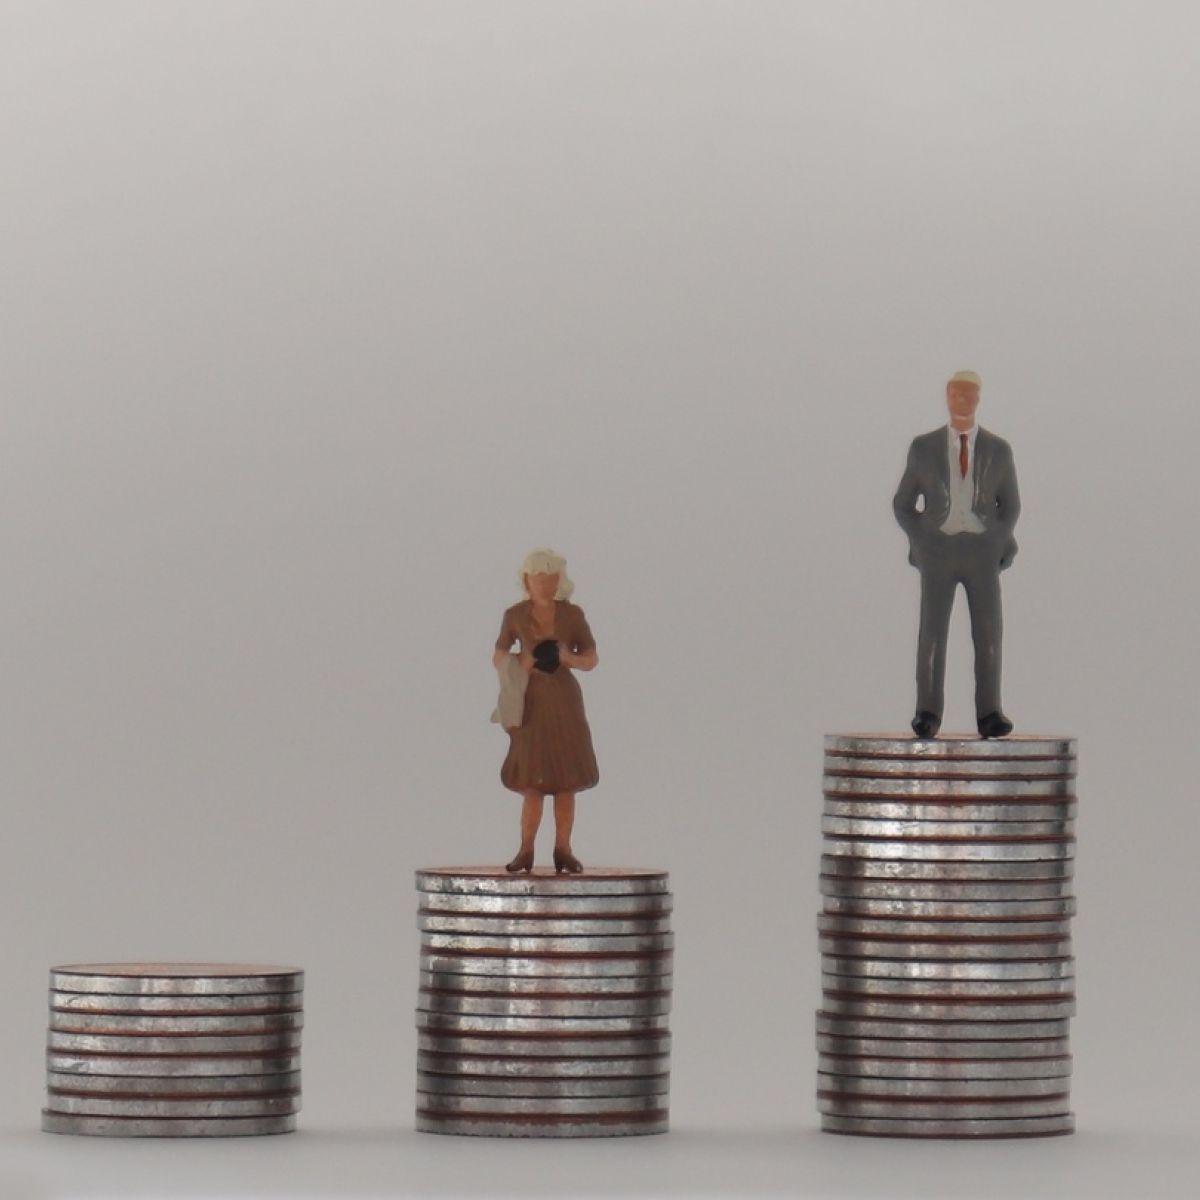 Irish women retire on €153 a week less than men – ESRI